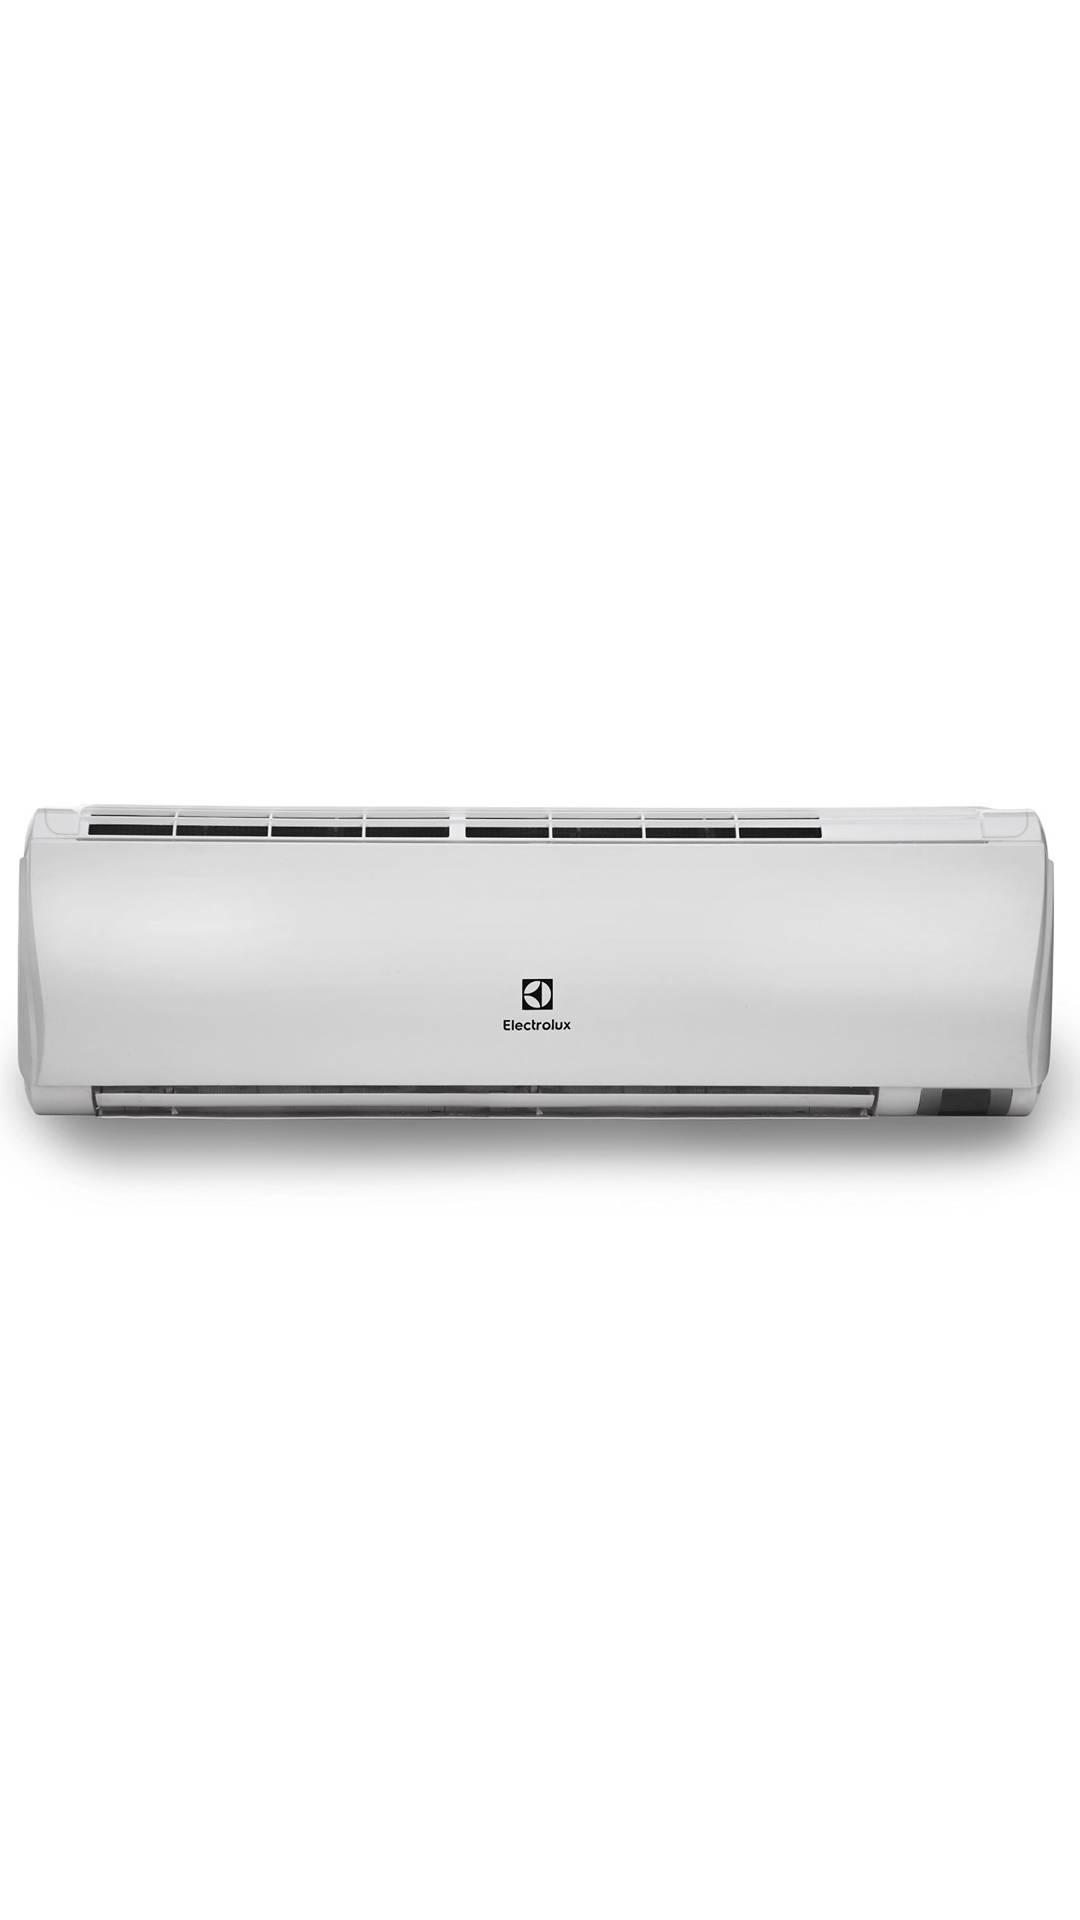 Electrolux ES18M5C 1.5 Ton 5 Star Split Air Conditioner